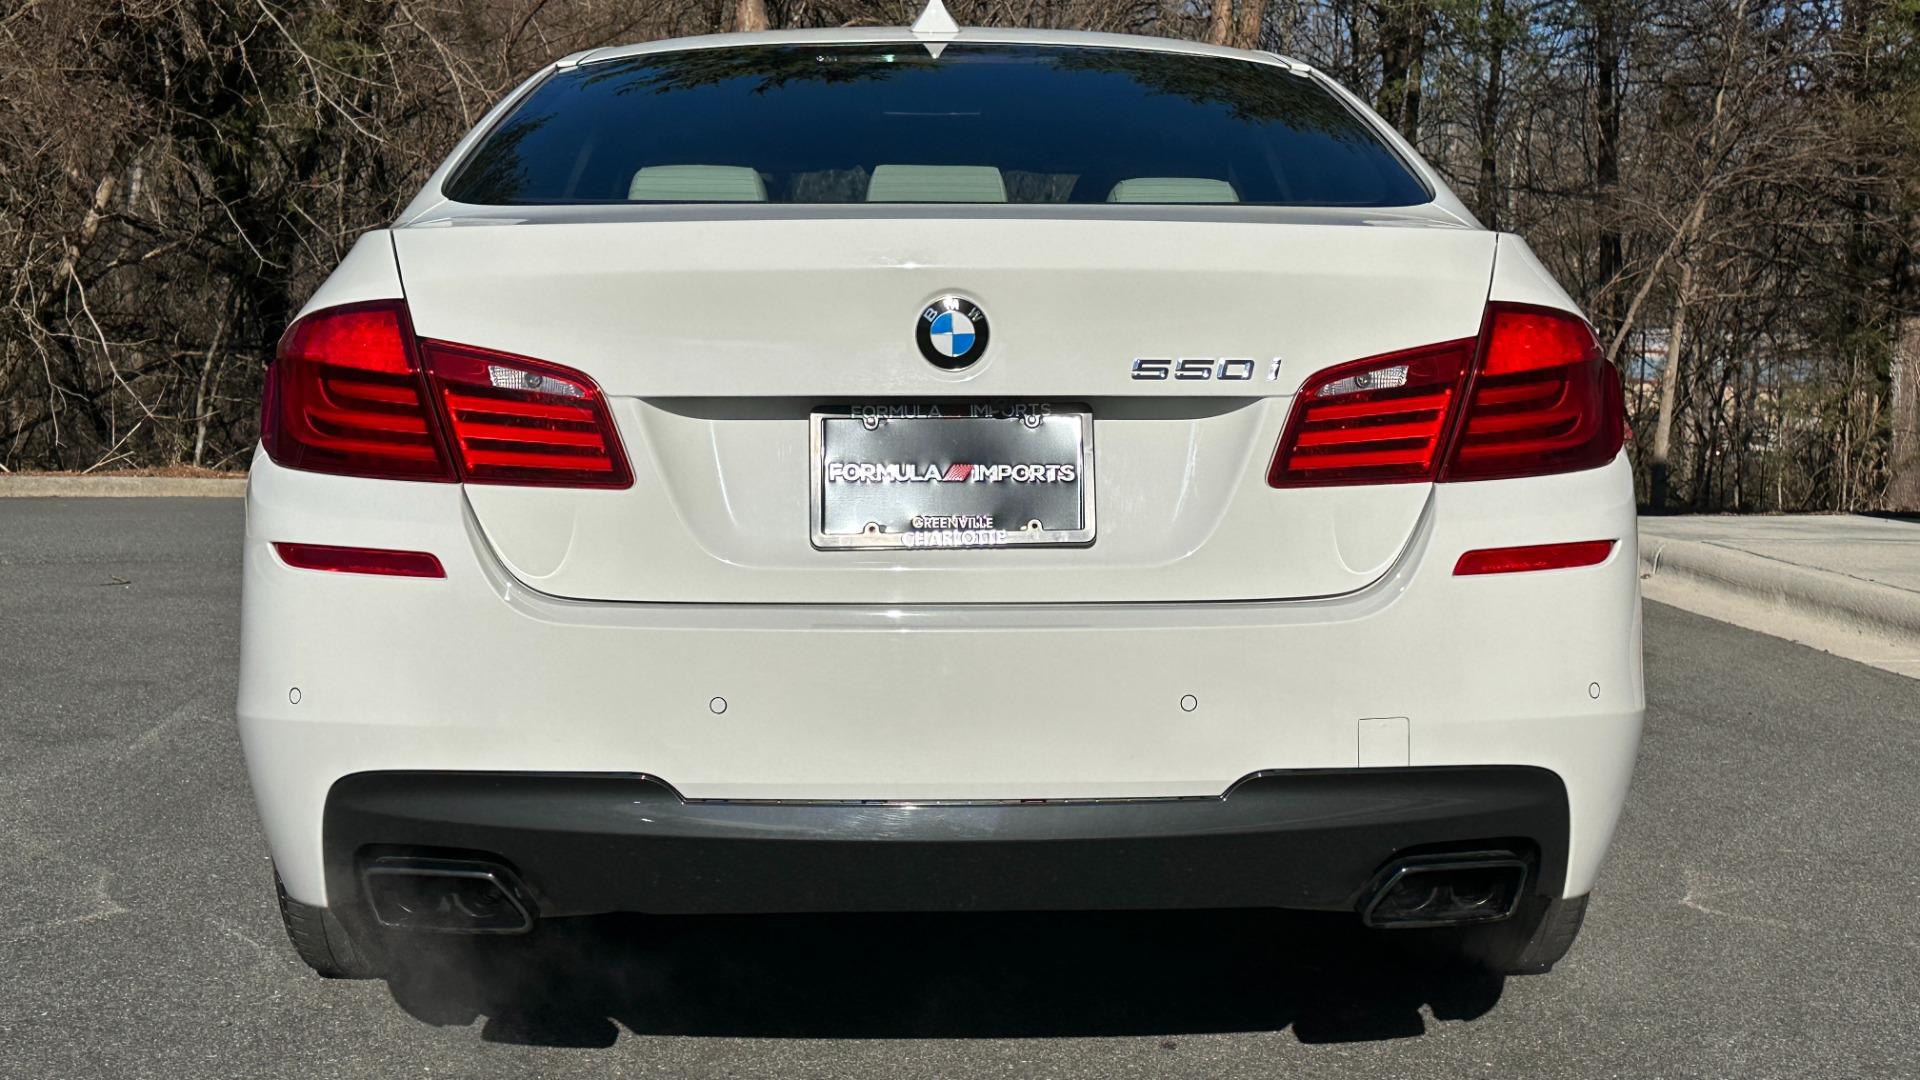 Used 2012 BMW 5 SERIES 550I M SPORT / NAV / CONV PKG / SUNROOF / PREM SND / REARVIEW for sale Sold at Formula Imports in Charlotte NC 28227 6